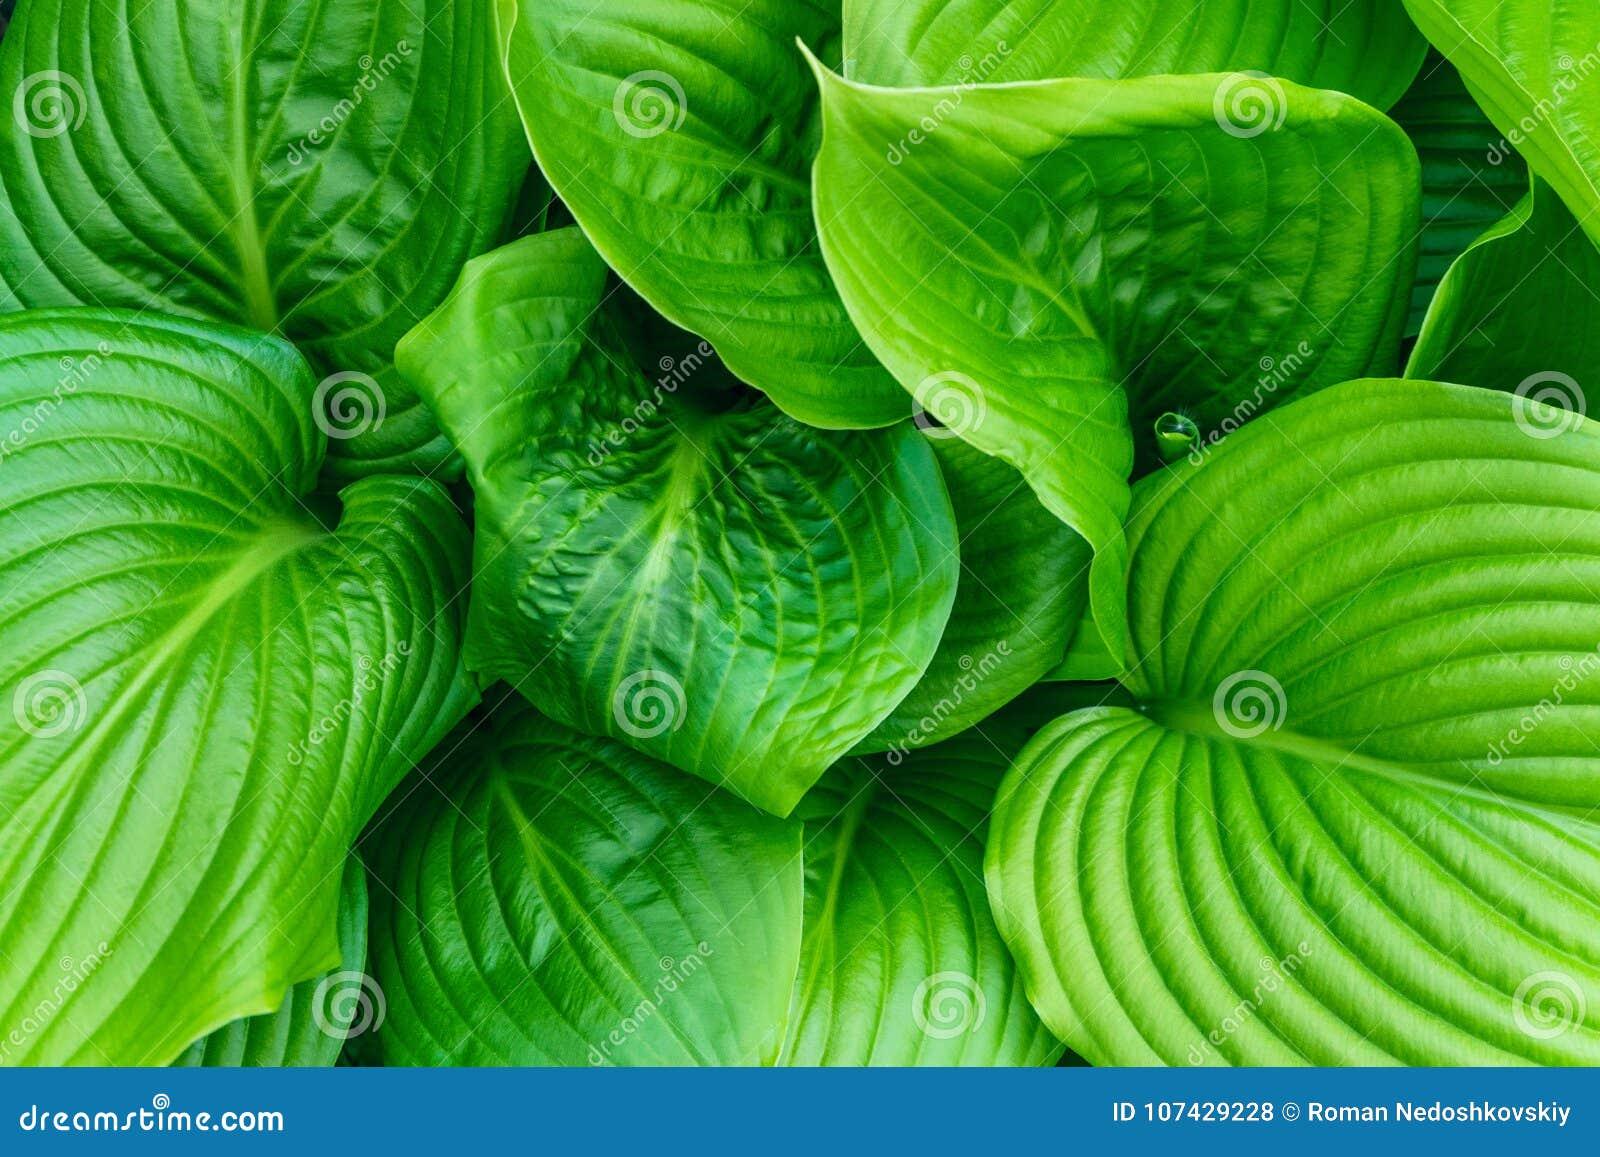 Beautiful Hosta leaves background. Hosta - an ornamental plant for landscaping park and garden design.